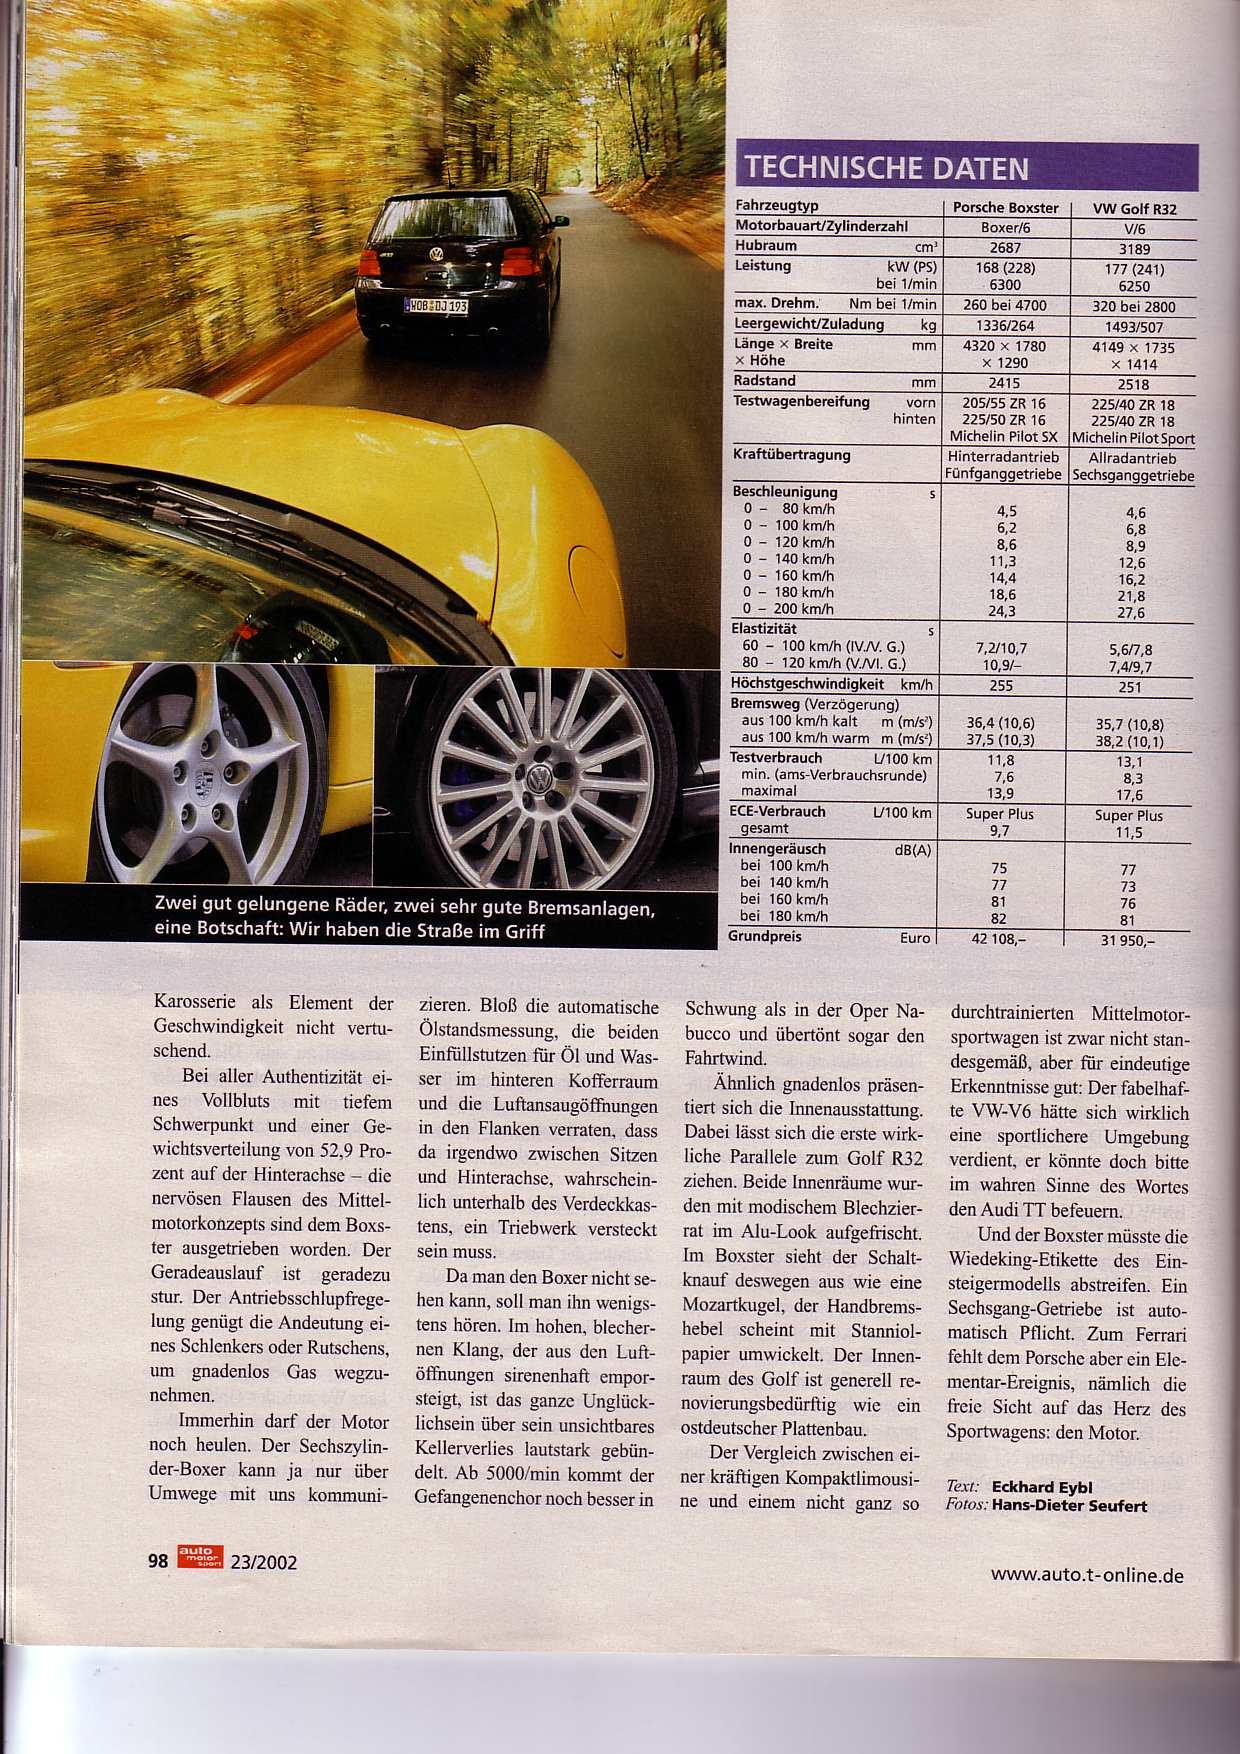 Porsche 986 Boxster S Vs Vw Golf R32 Auto Motor Und Sport